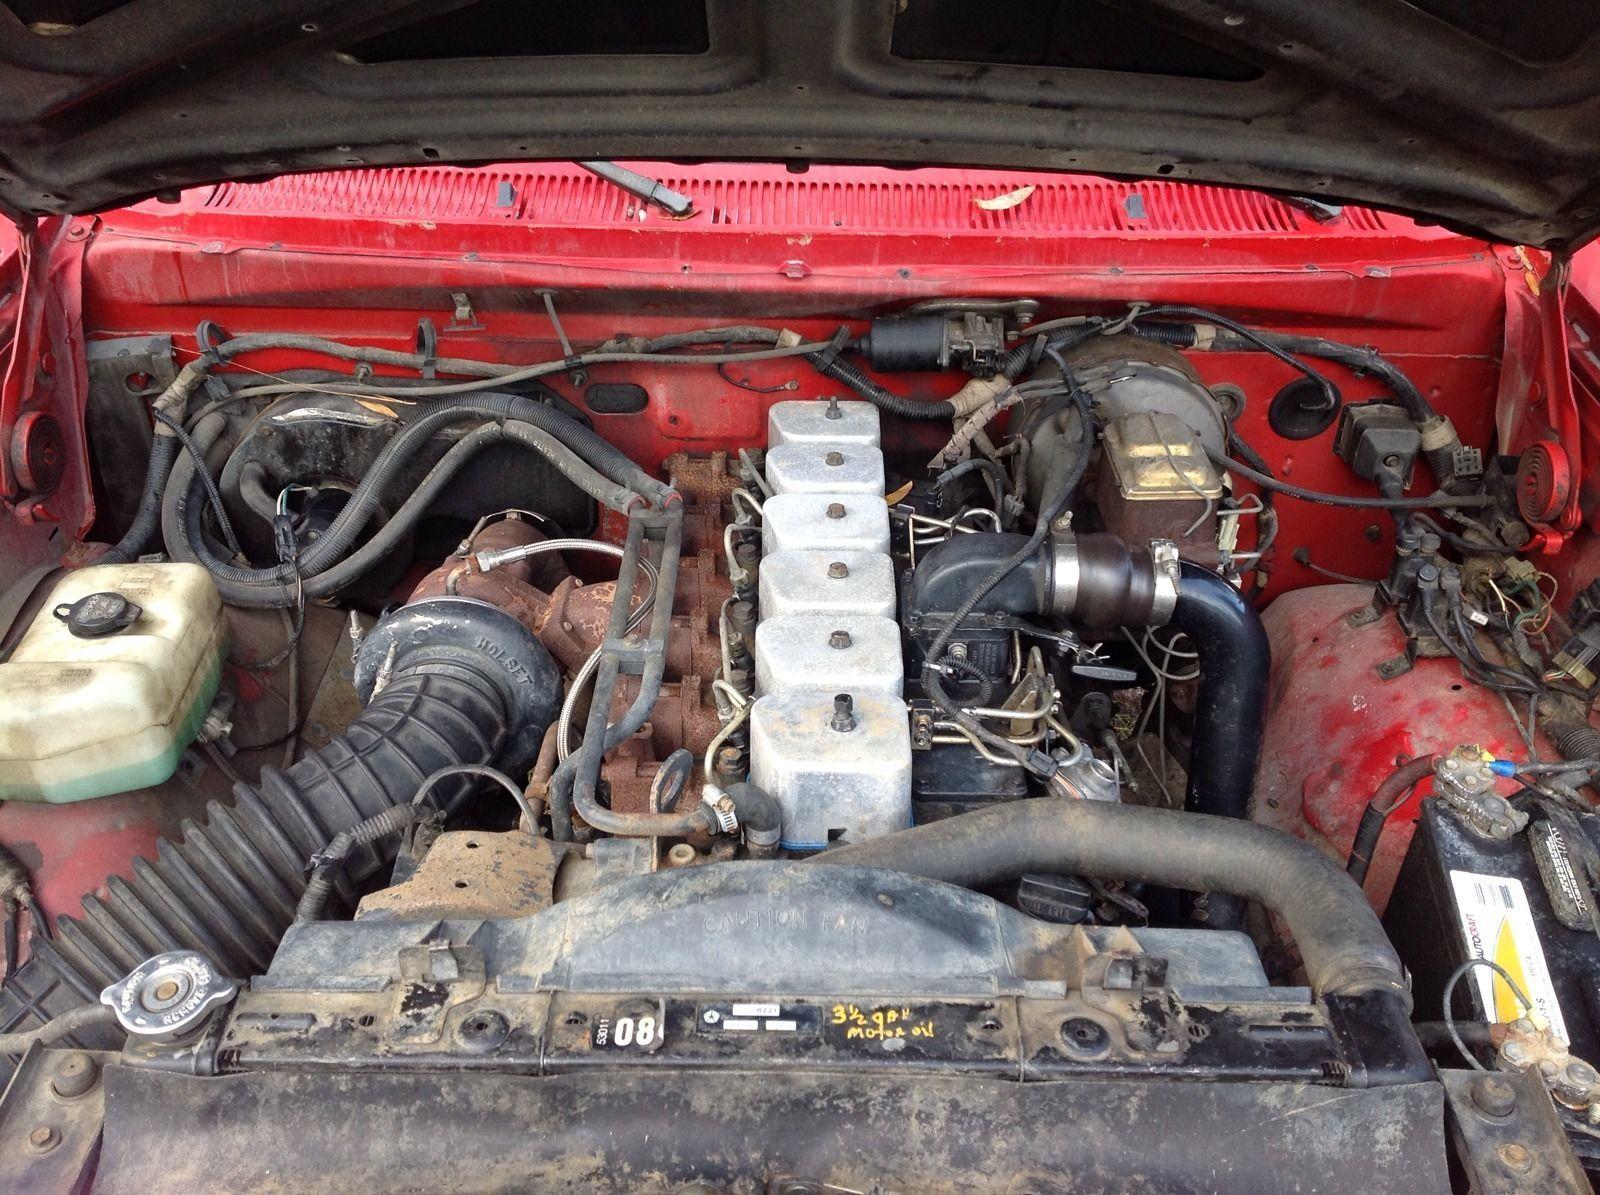 1993 Dodge Ram 12 Valve 5 9 Cummins Turbo Diesel 4x4 4wd